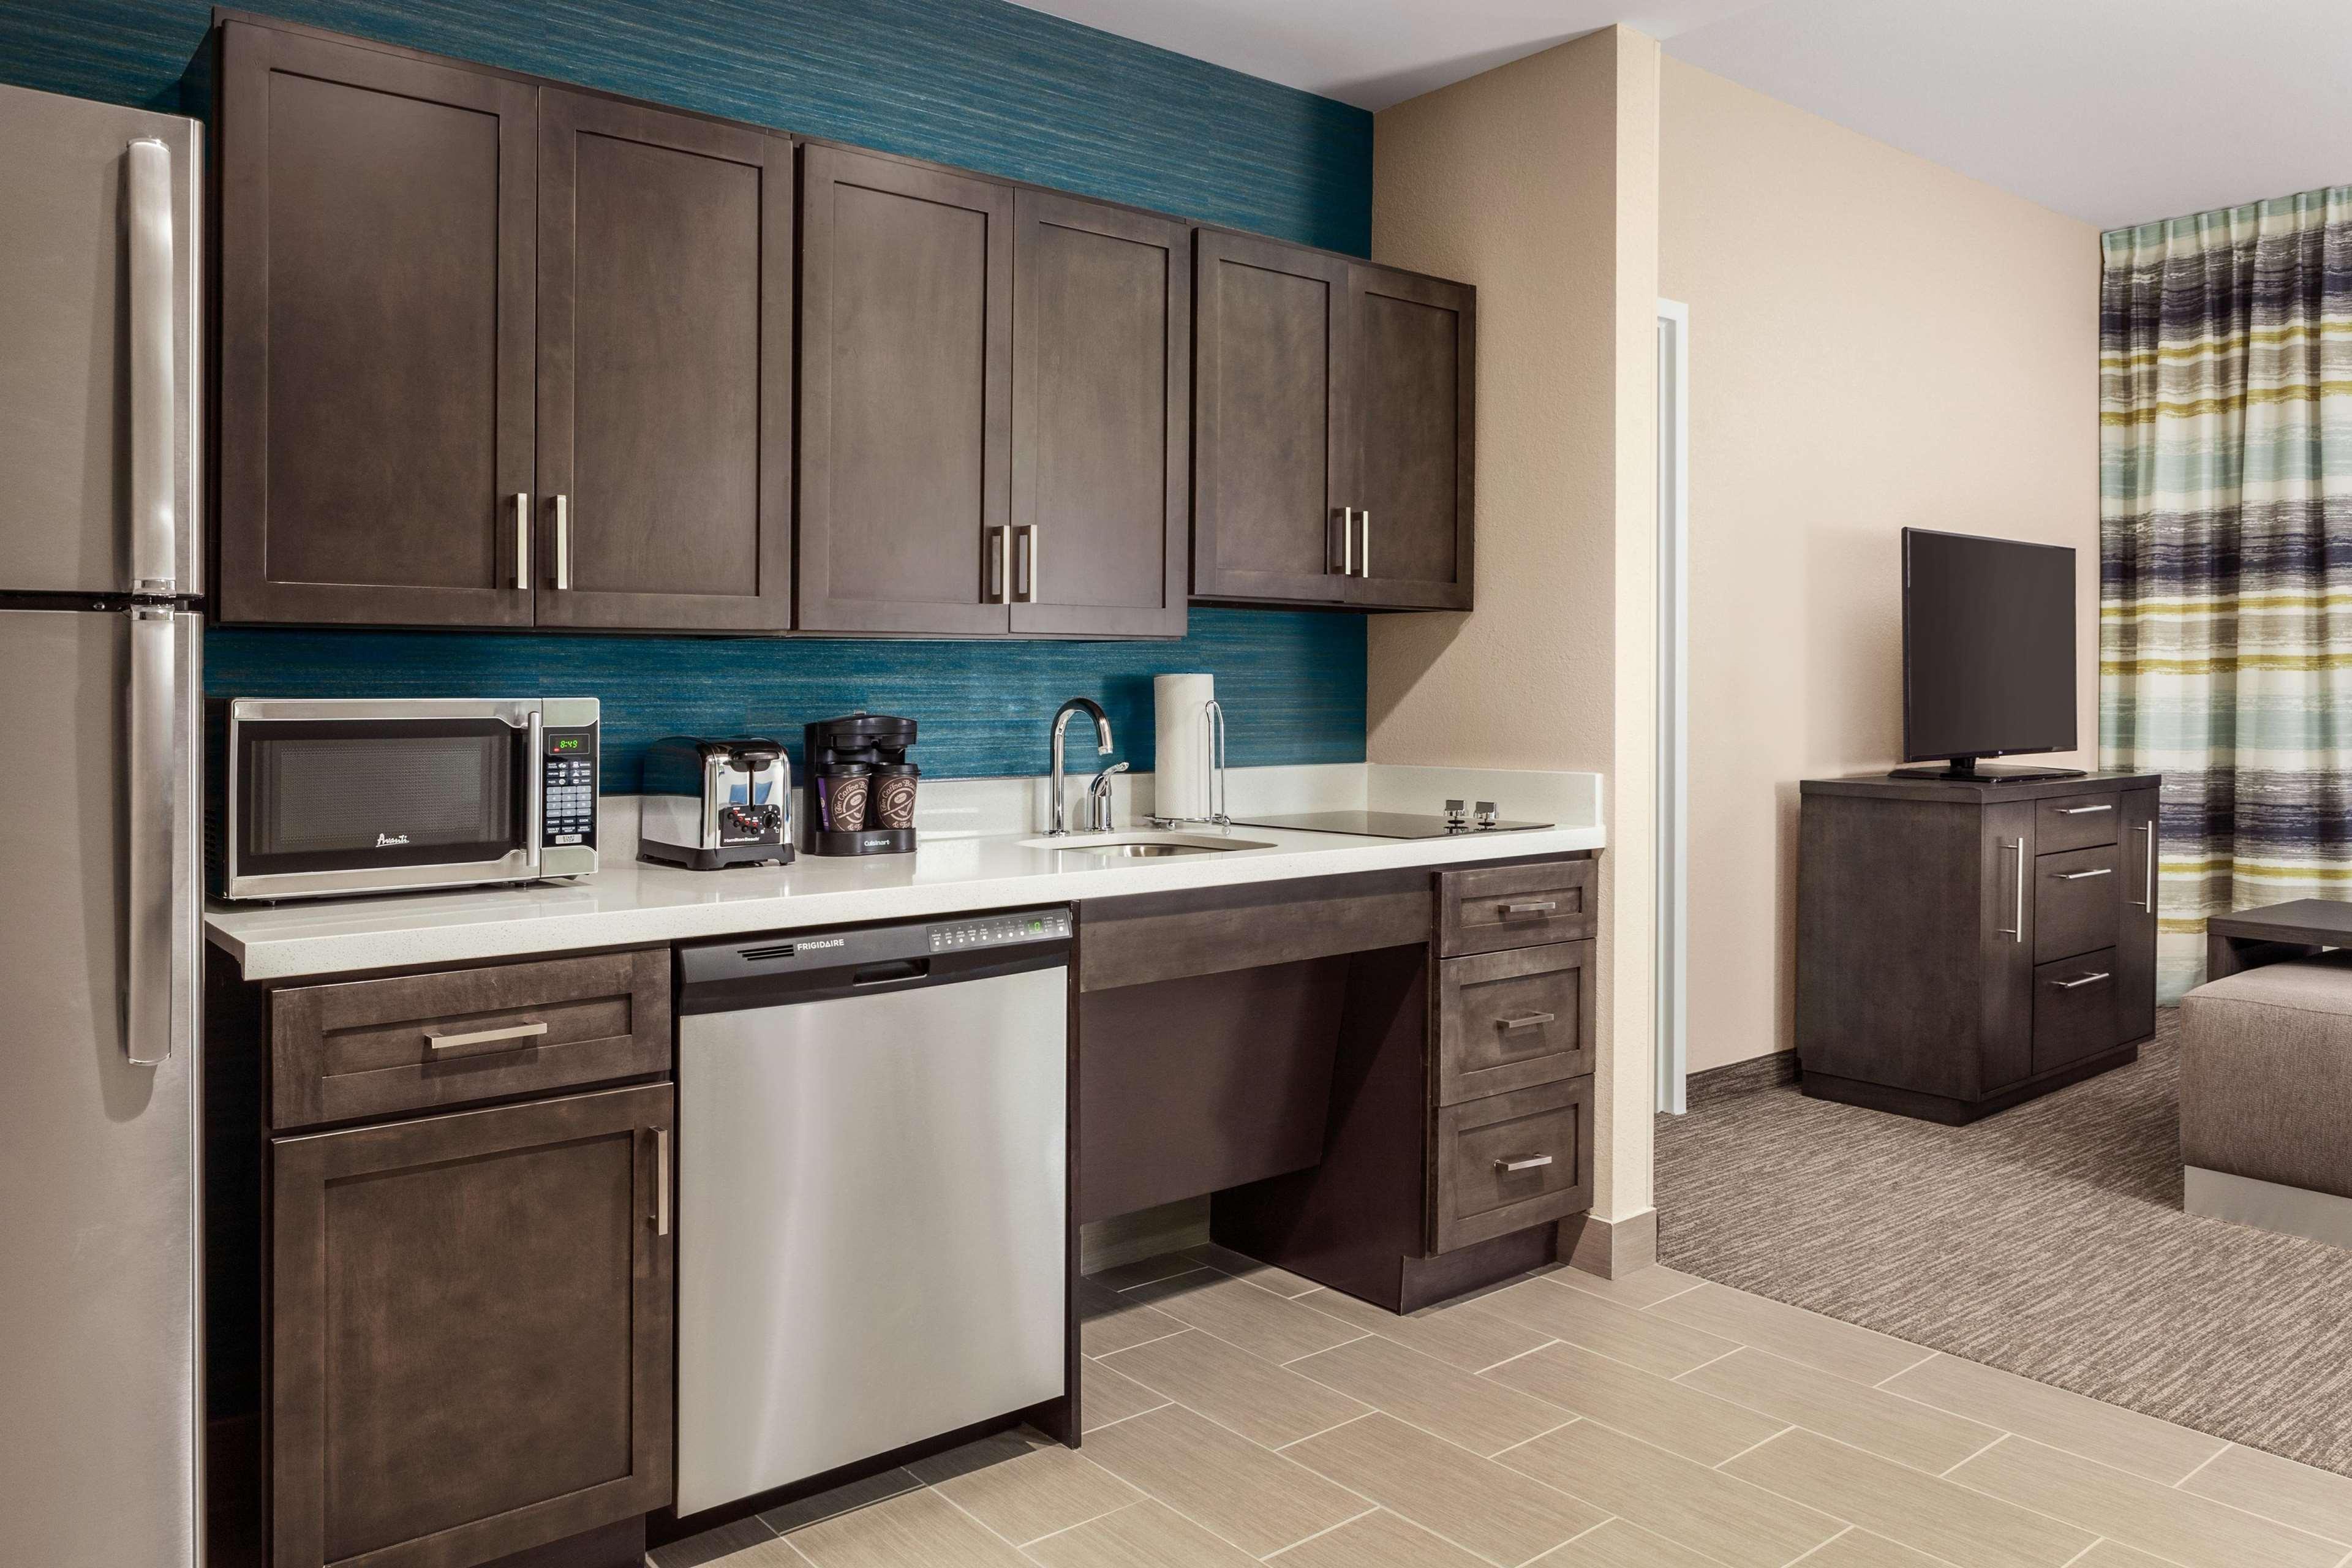 Homewood Suites by Hilton Charlotte/SouthPark image 32